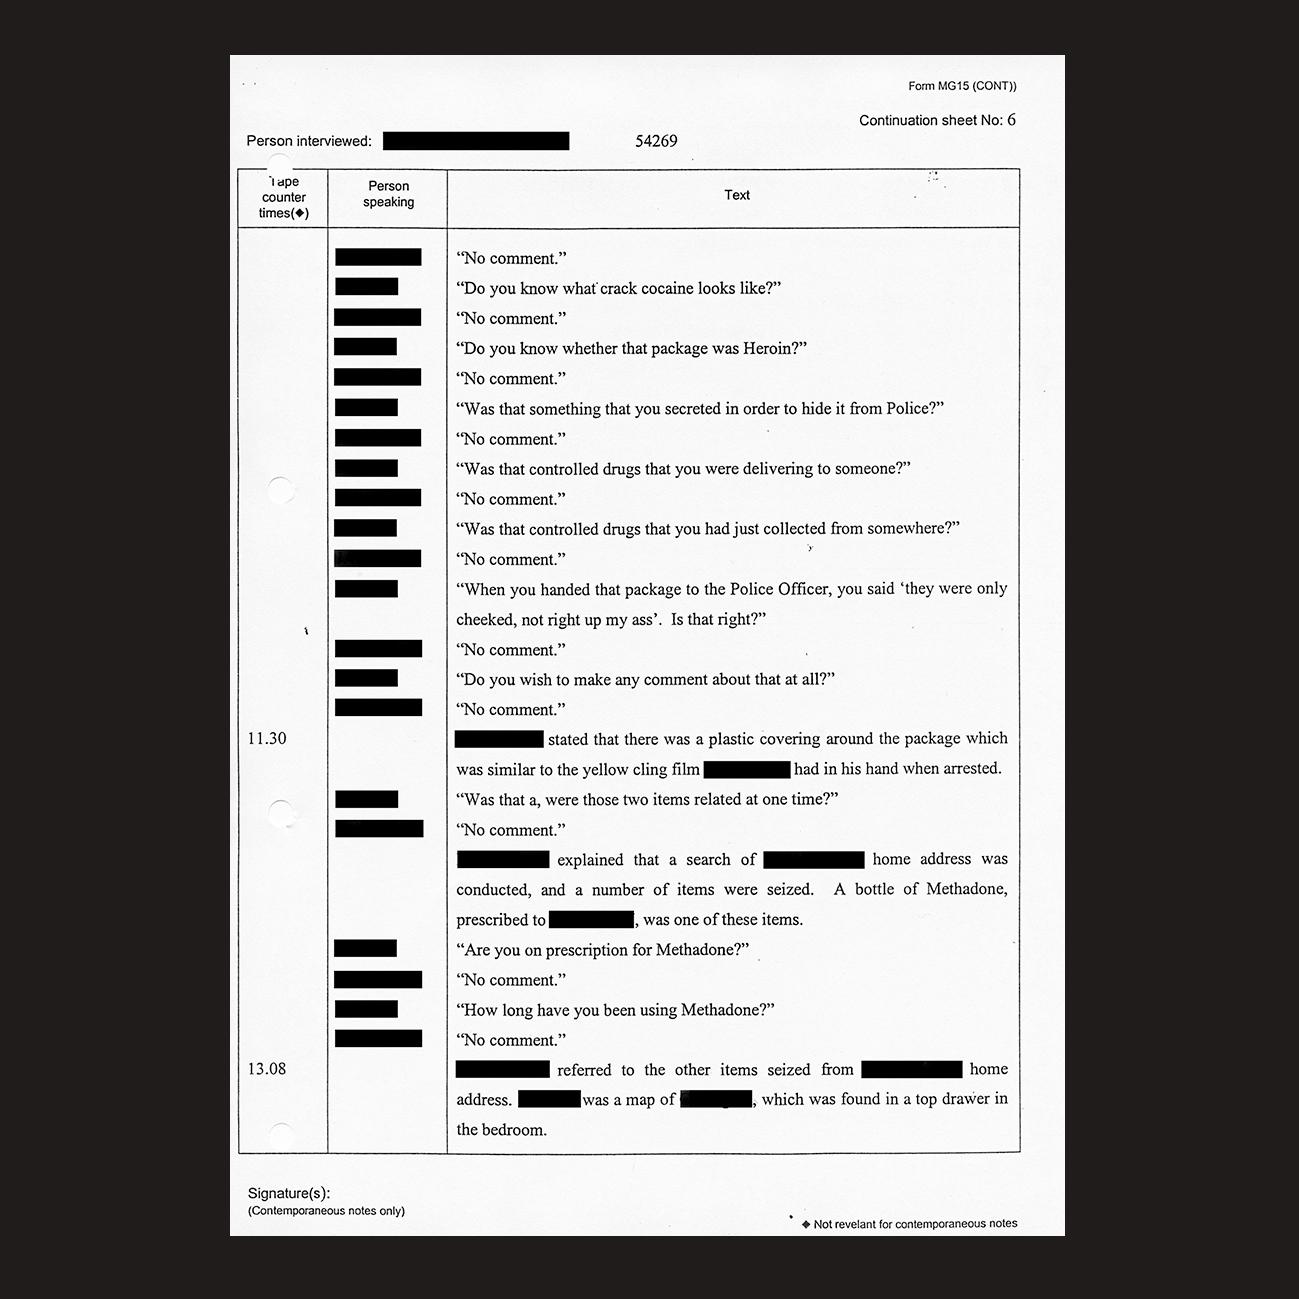 JM Bail 141 - Interview 3 - Only Cheeked.jpg